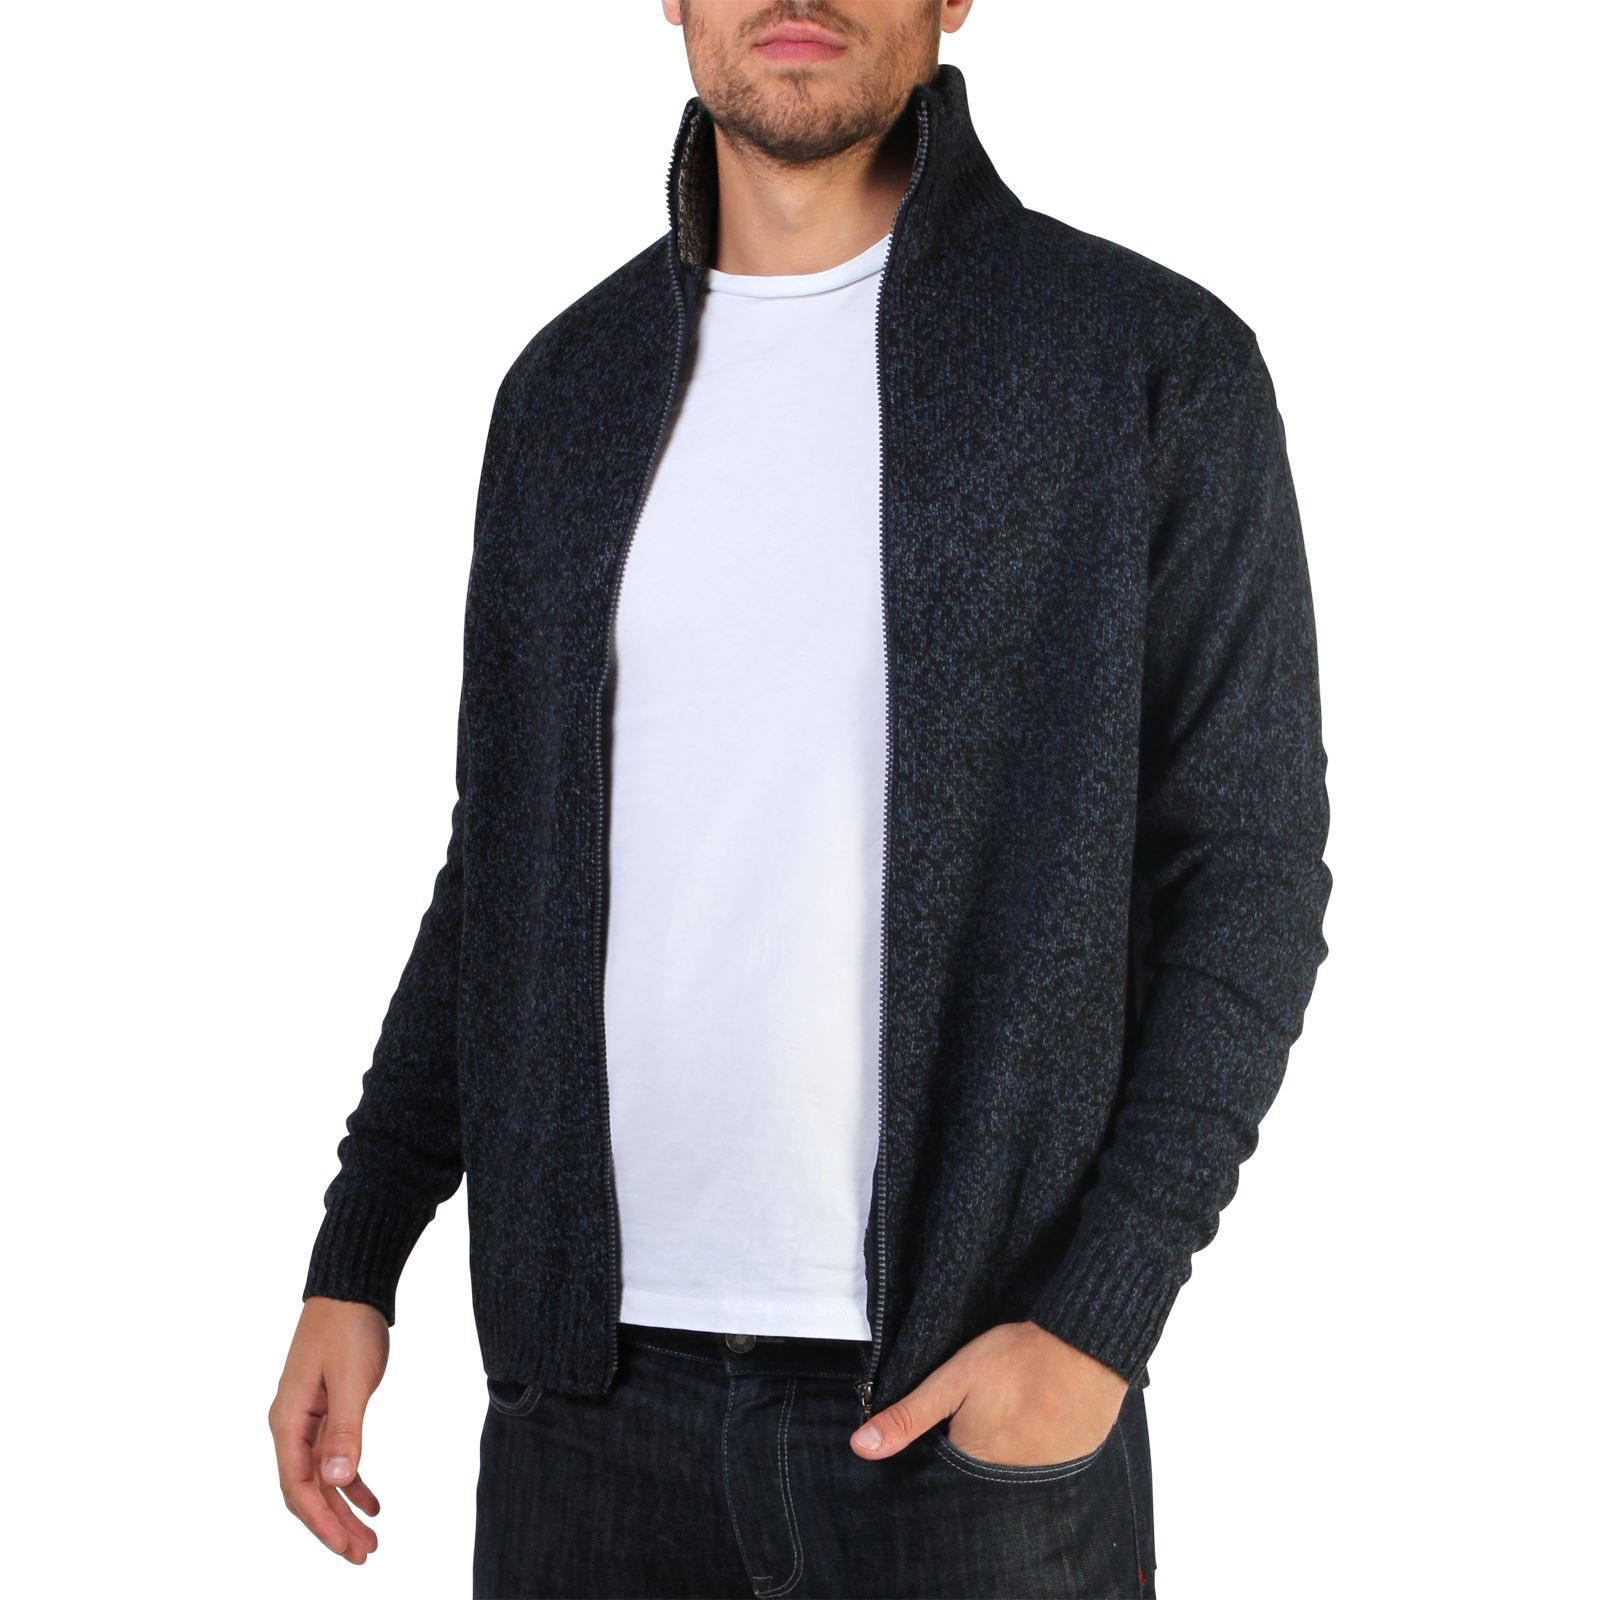 Mens-Wool-Jumper-Winter-Sweater-Zip-Up-Funnel-Neck-Soft-Knit-Cardigan-Top thumbnail 12